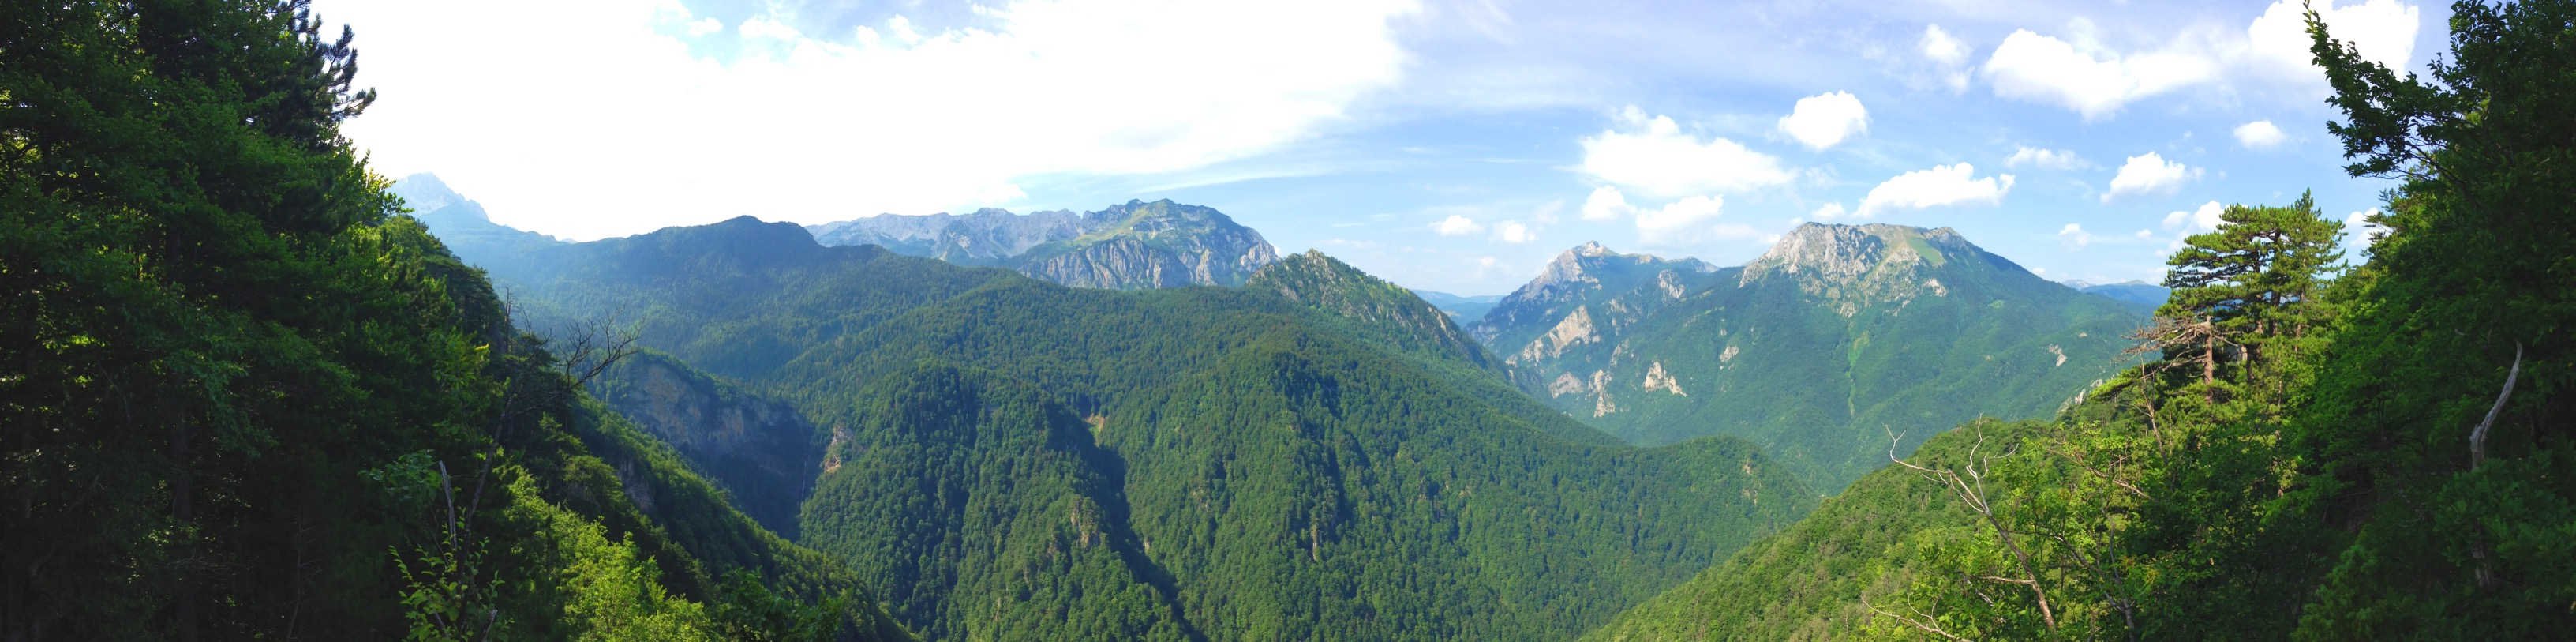 Foreste in Montenegro